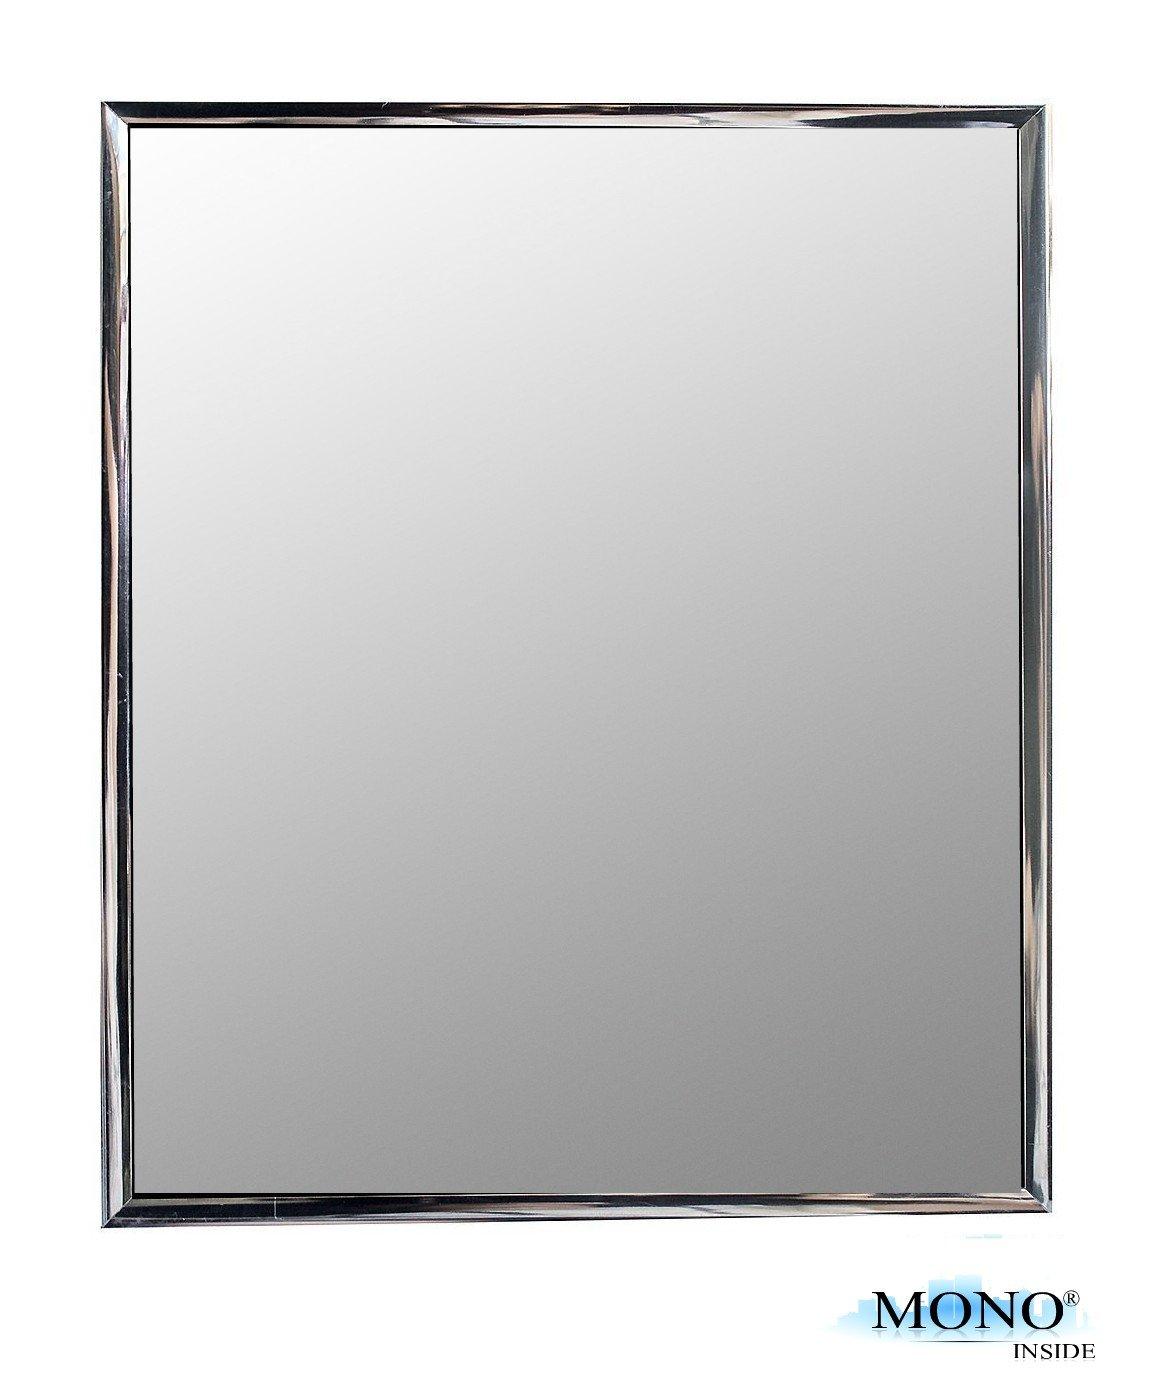 Big Mirrors For Wall Amazon